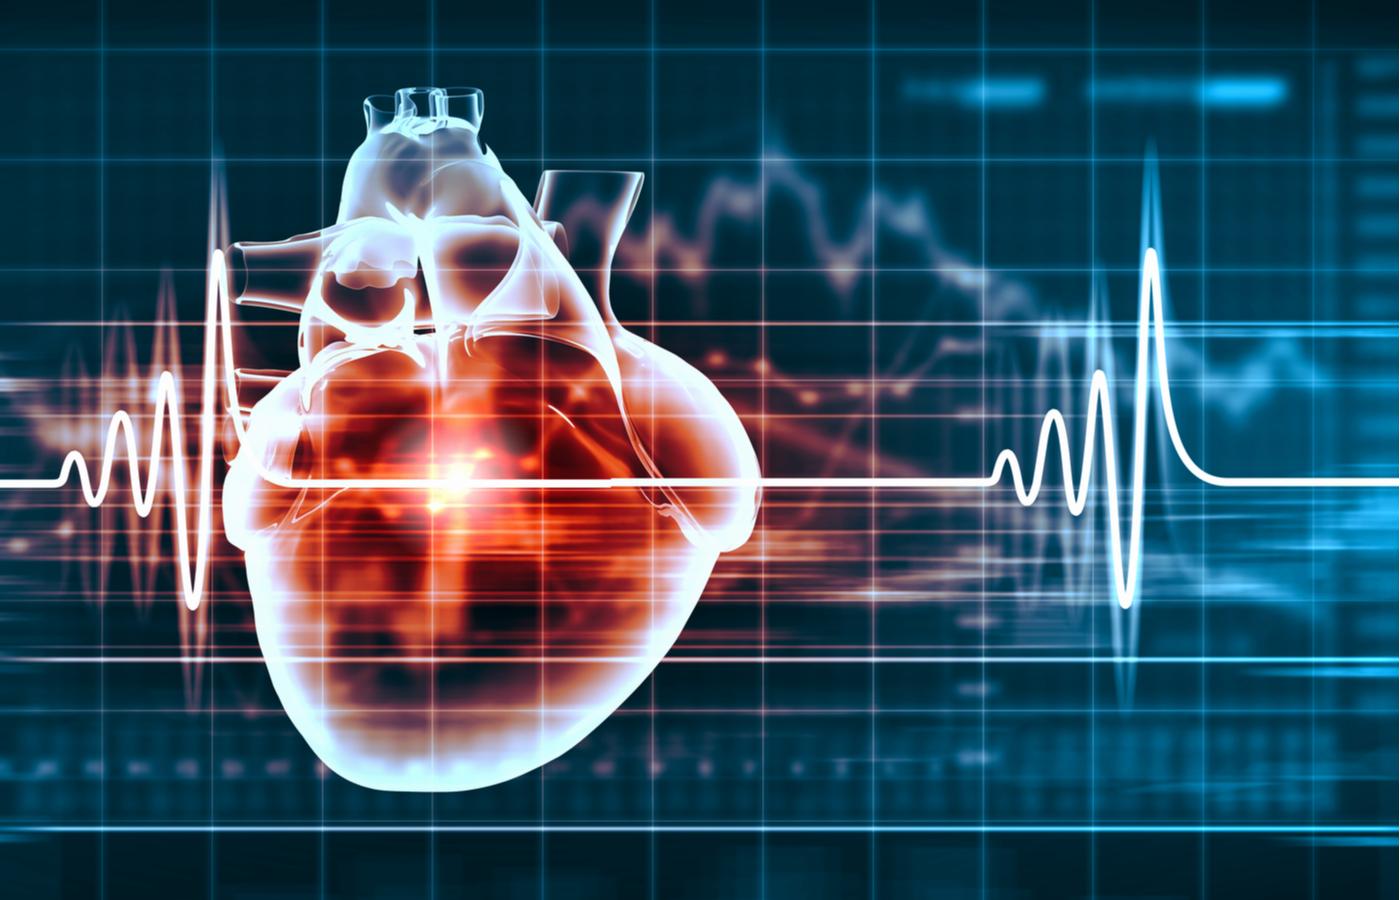 virtual image of a human heart